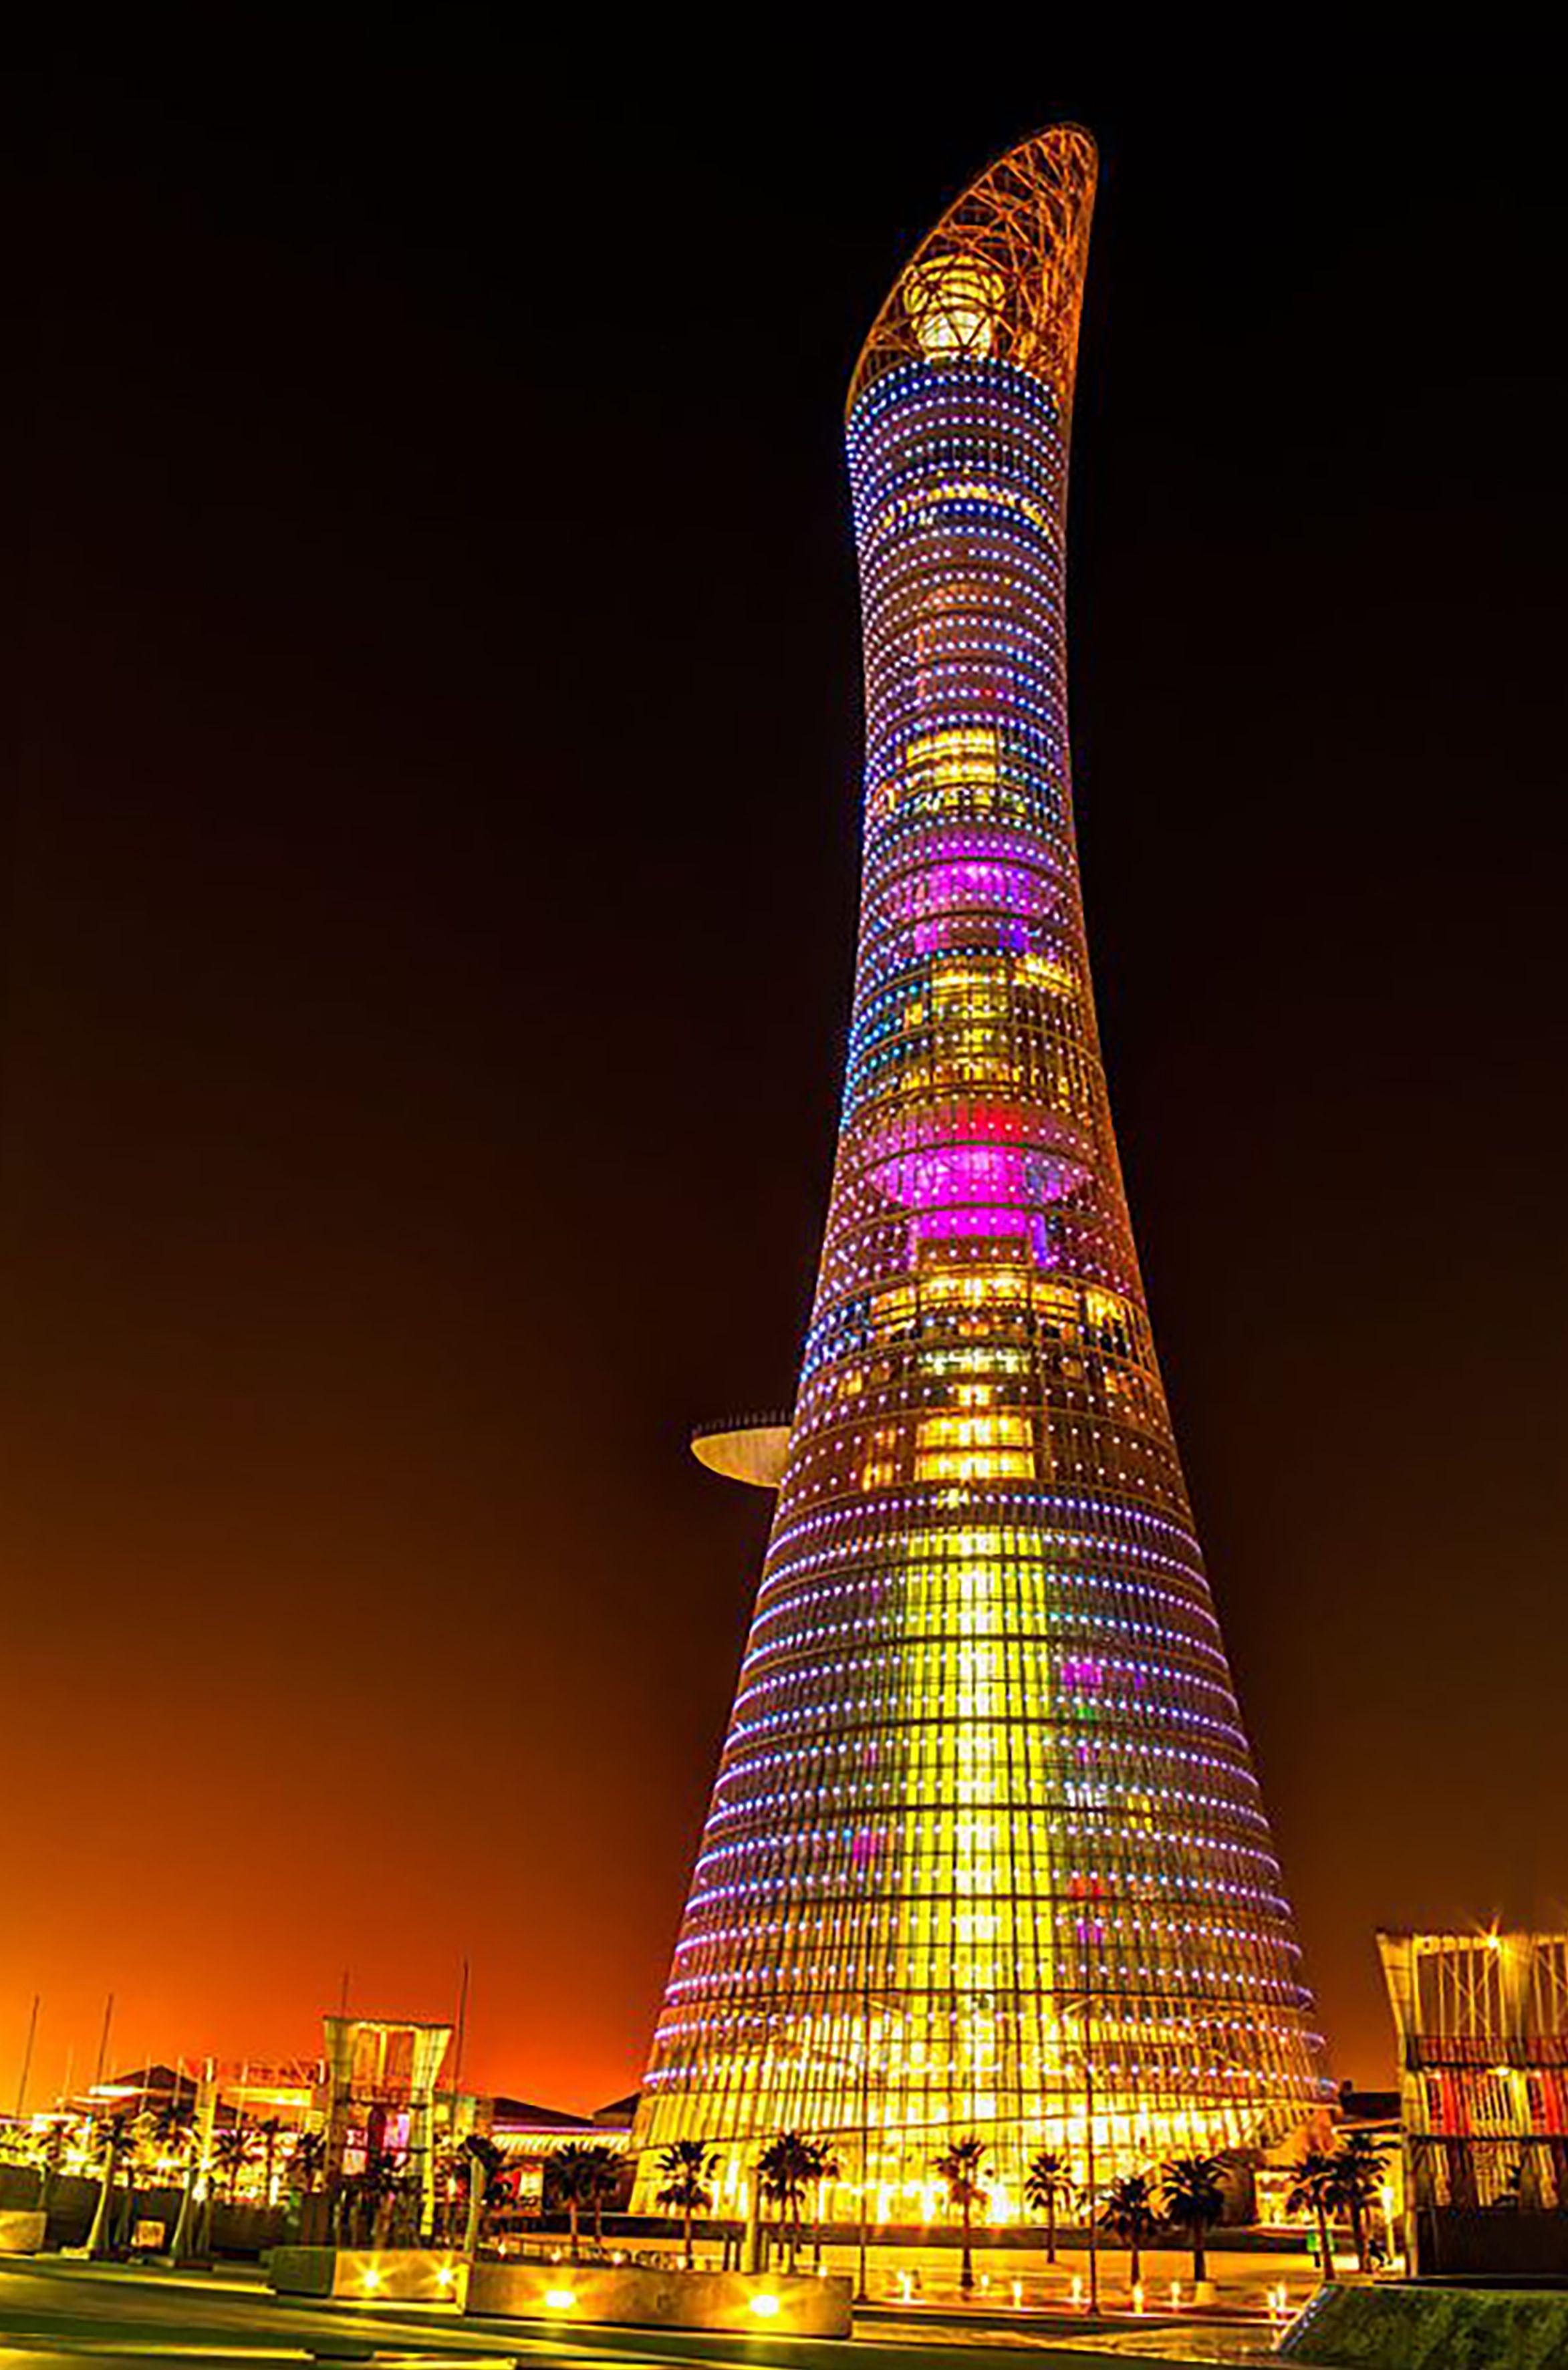 Aspire Tower: a.k.a The Torch Doha | Qatar travel, Building, Landmark  buildings